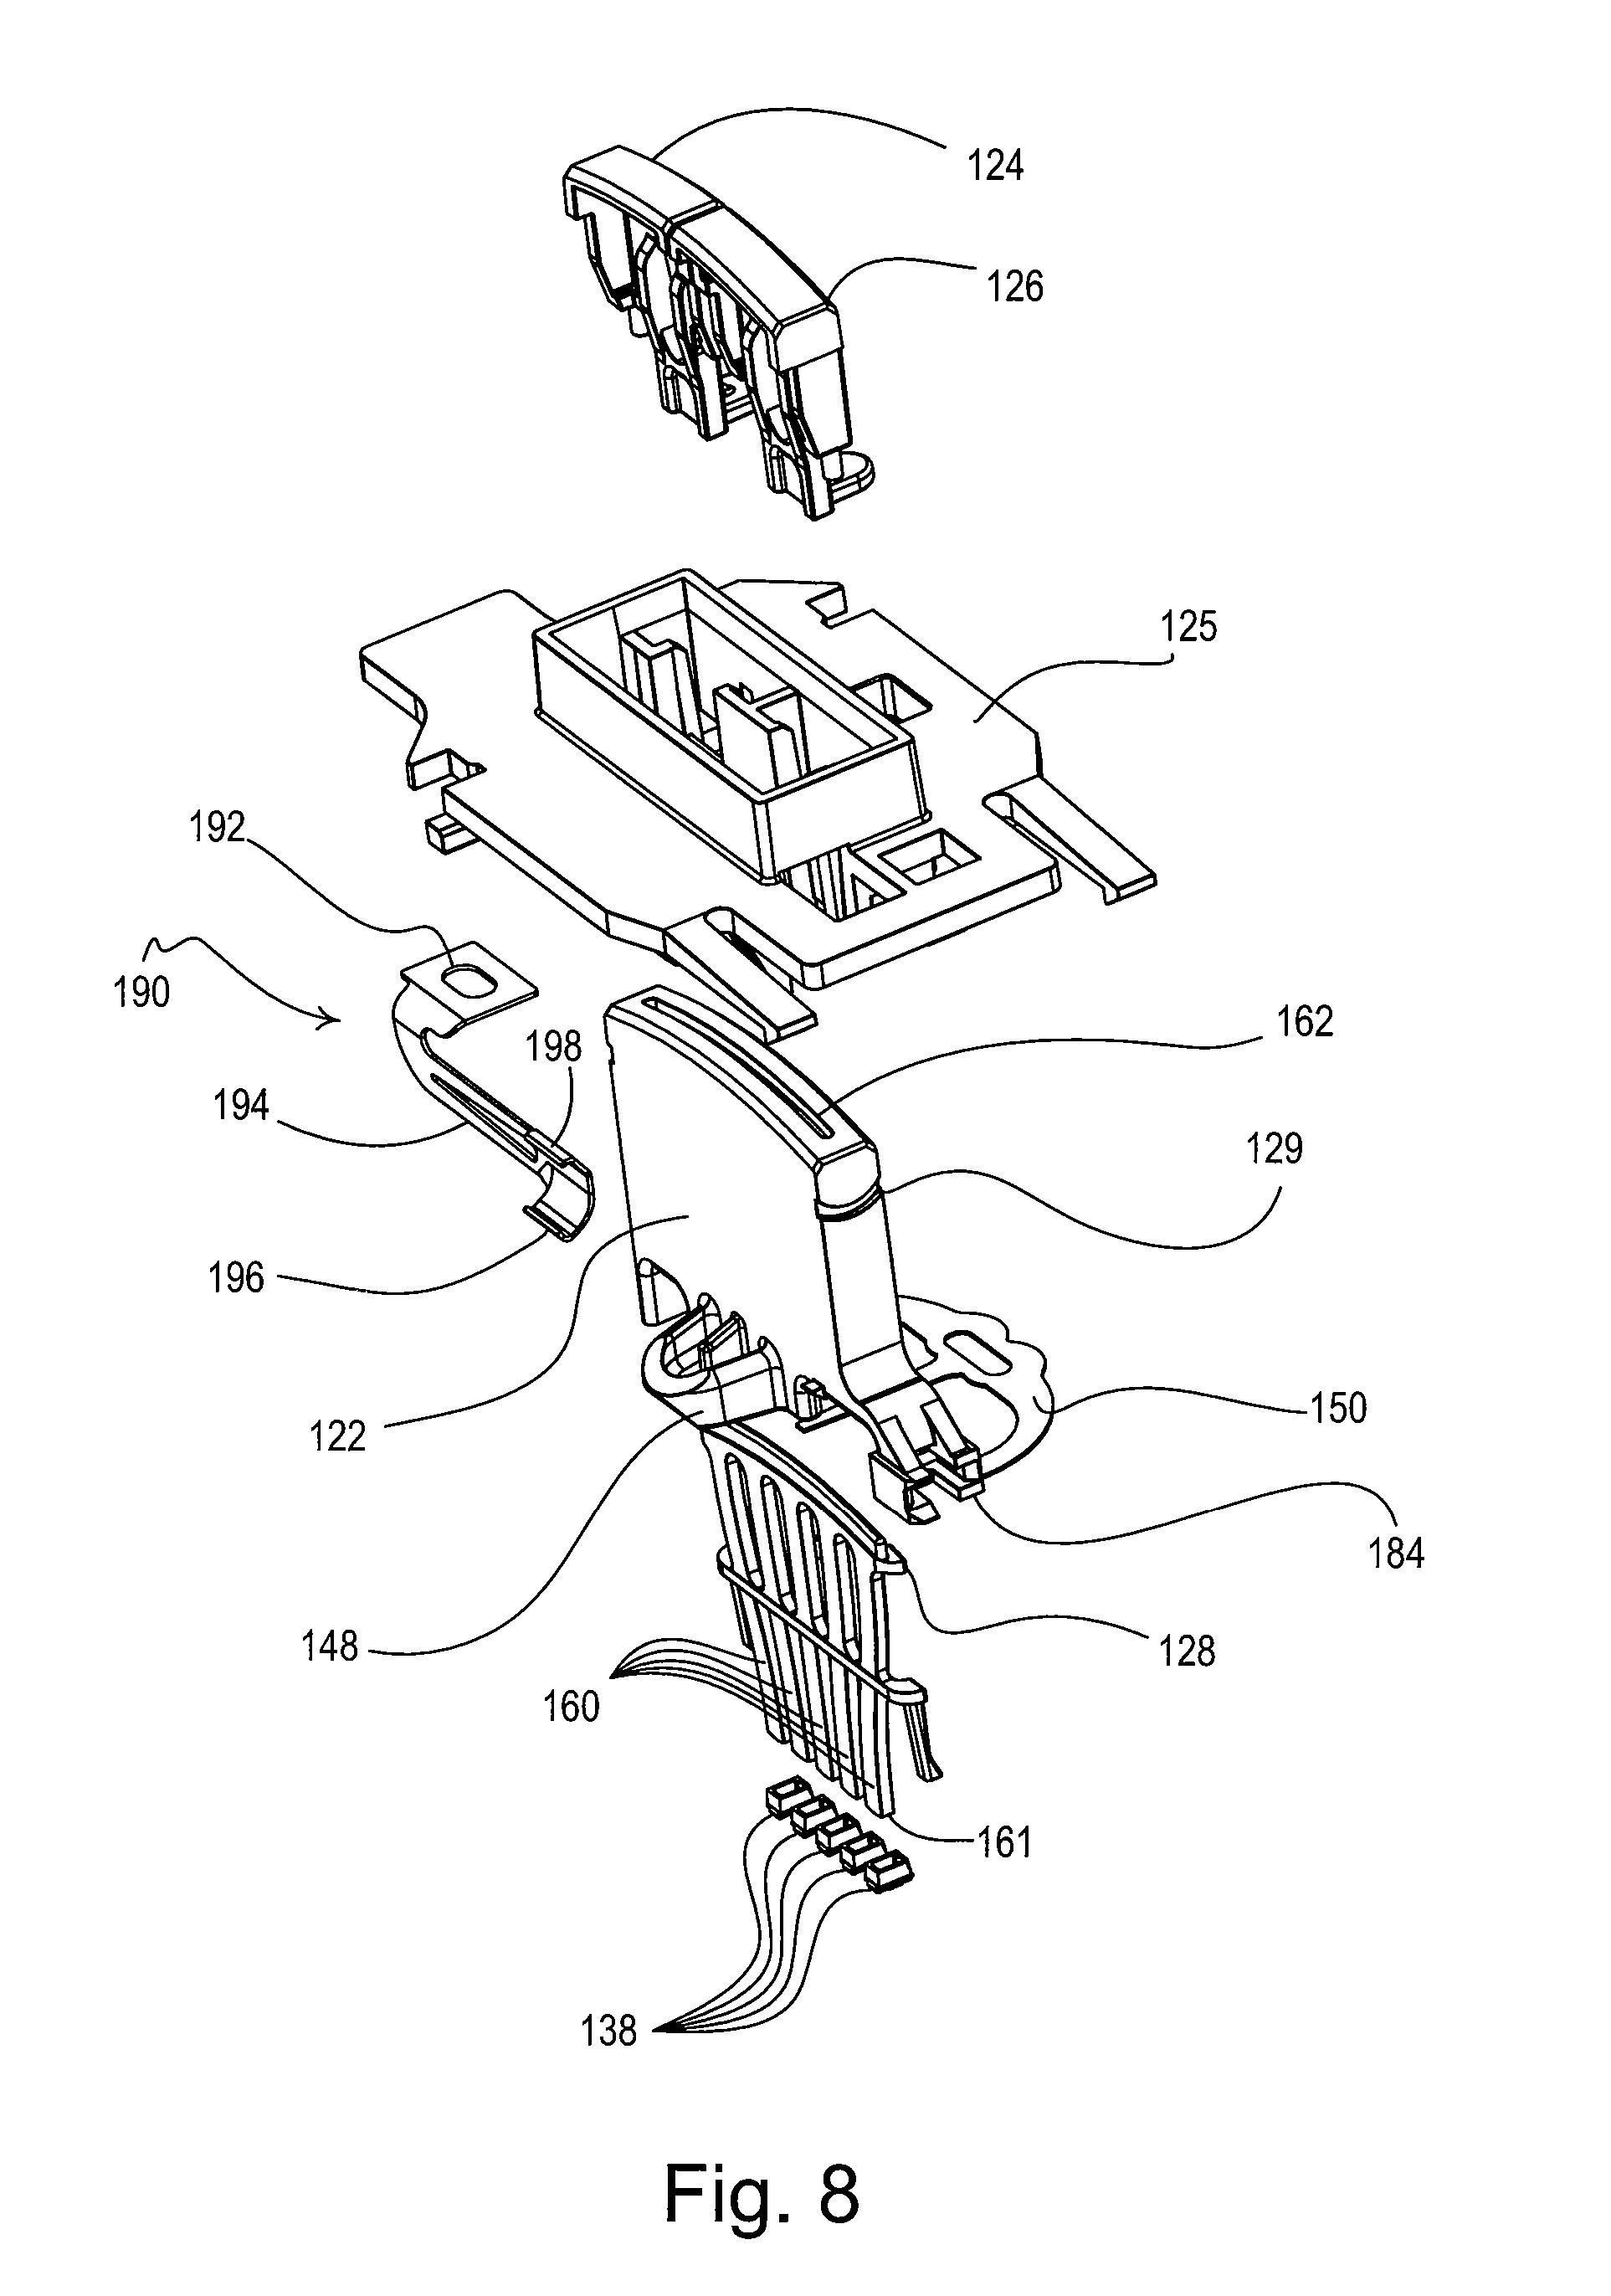 3 Way Switch Light Wiring Diagram Blank, 3, Free Engine